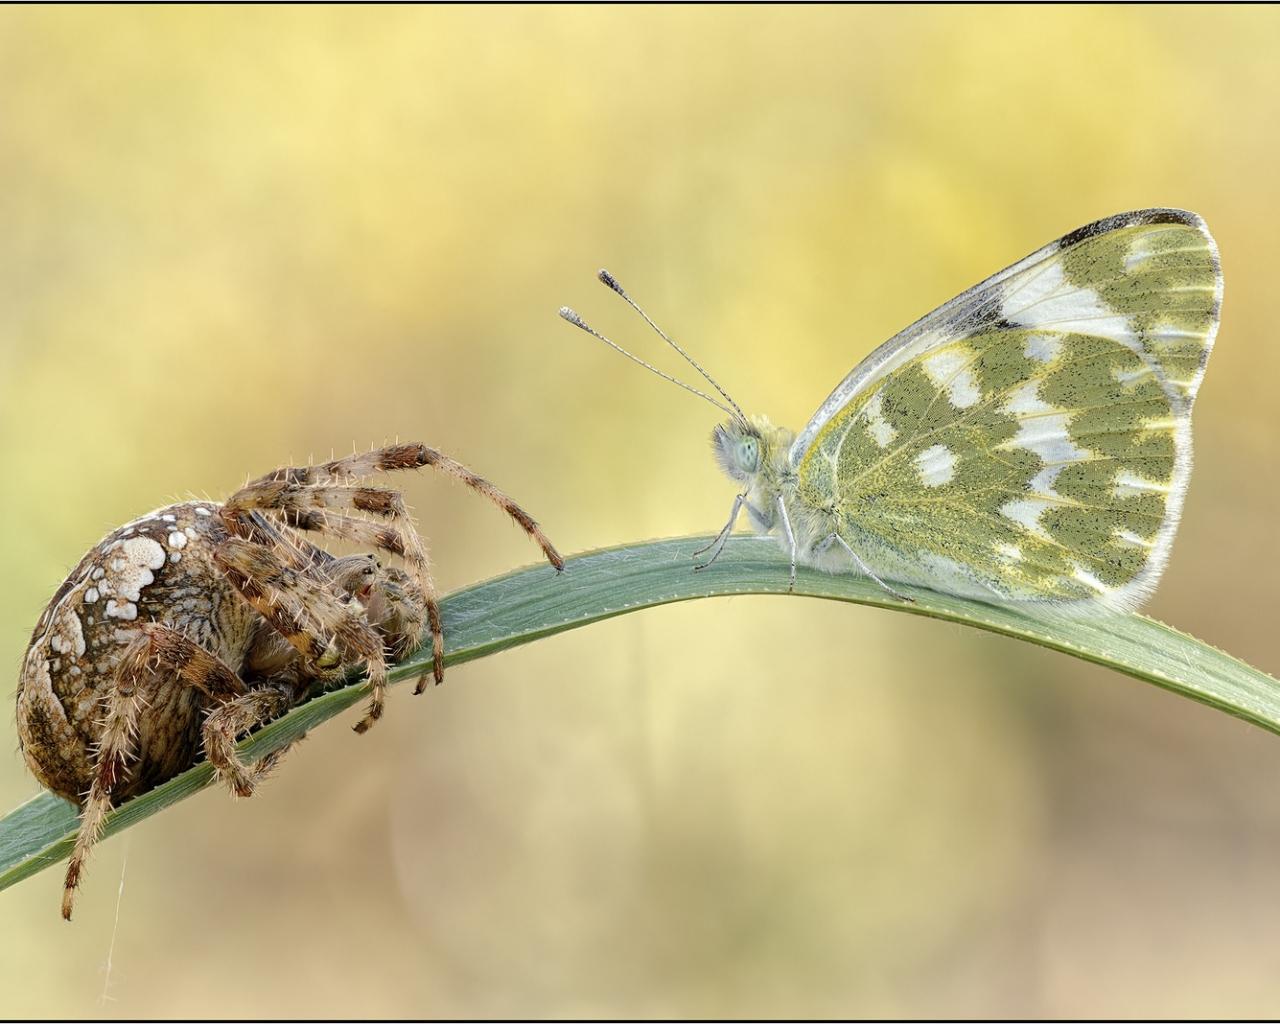 Araña vs Mariposa - 1280x1024